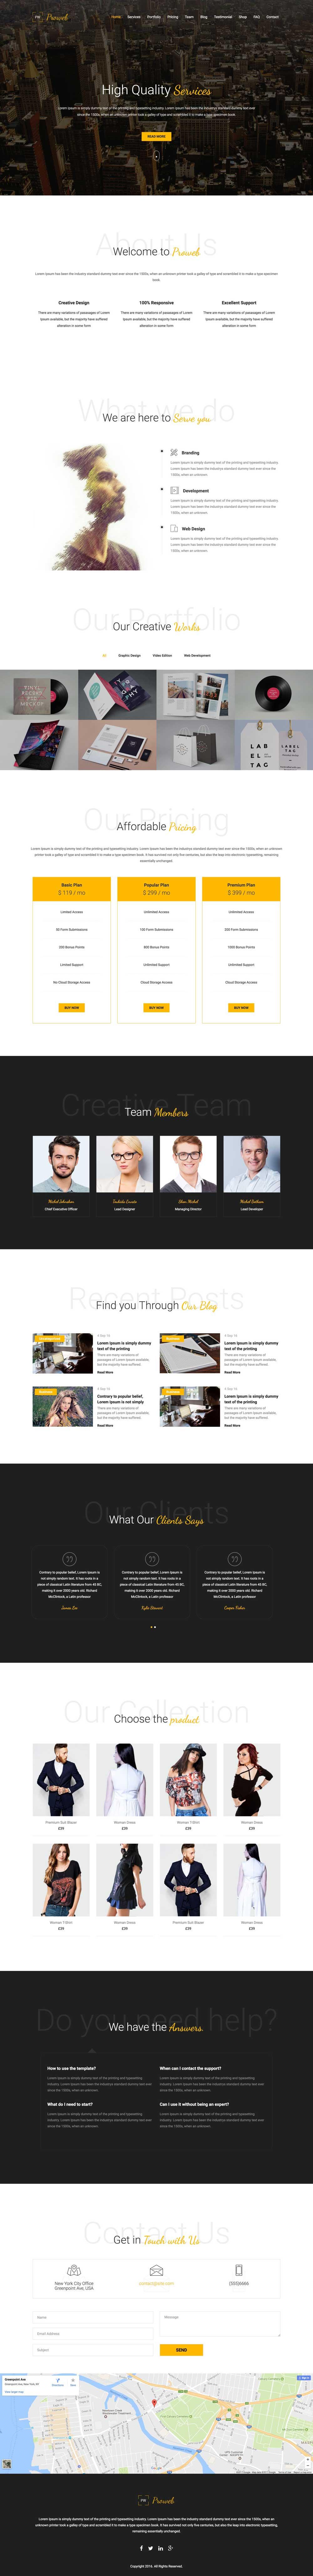 Proweb – One Page WordPress Theme Free Download